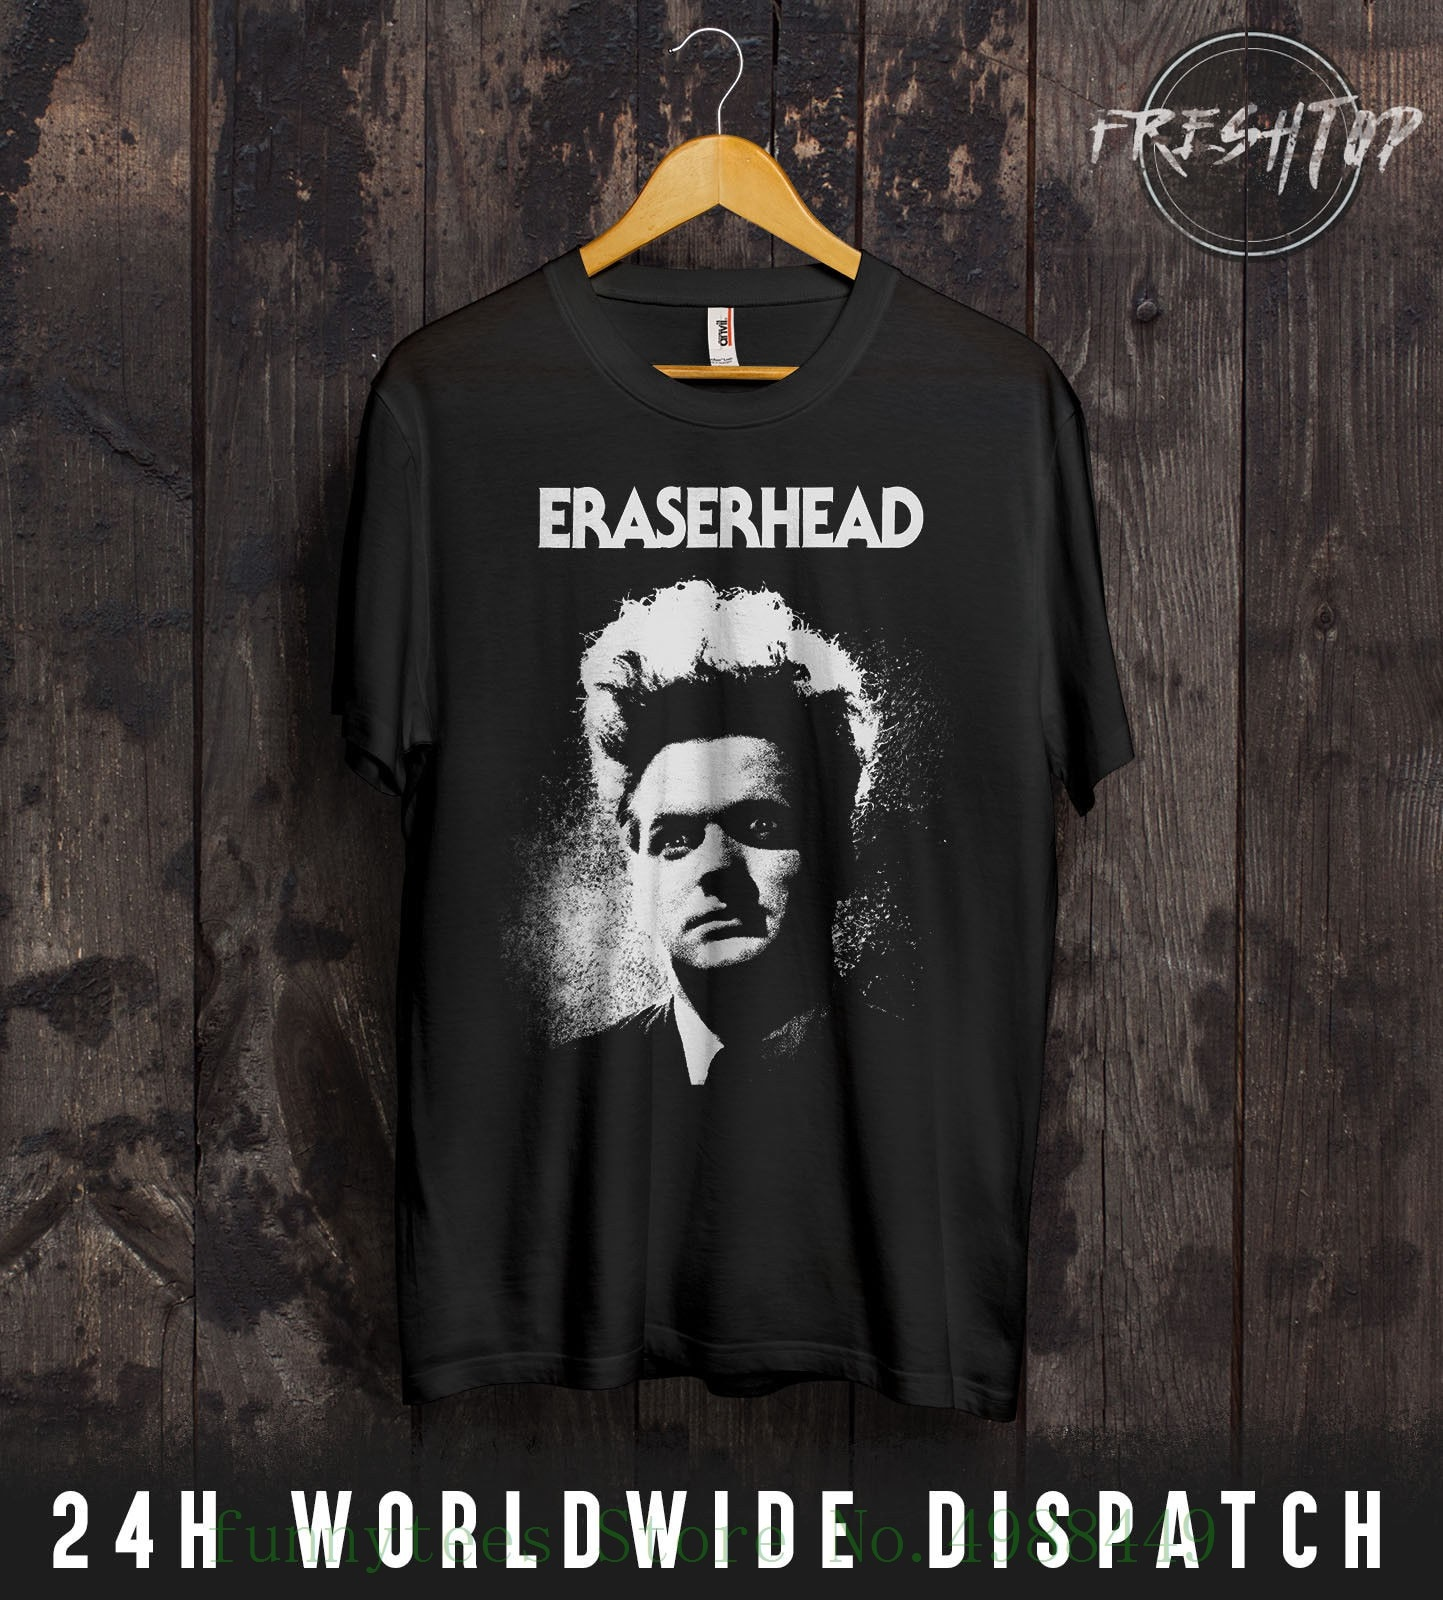 Eraserhead T Shirt David Lynch Cult Horror Movie Twin Peaks Gift S - Xxxl Youth's Short Sleeve Tshirt Cotton